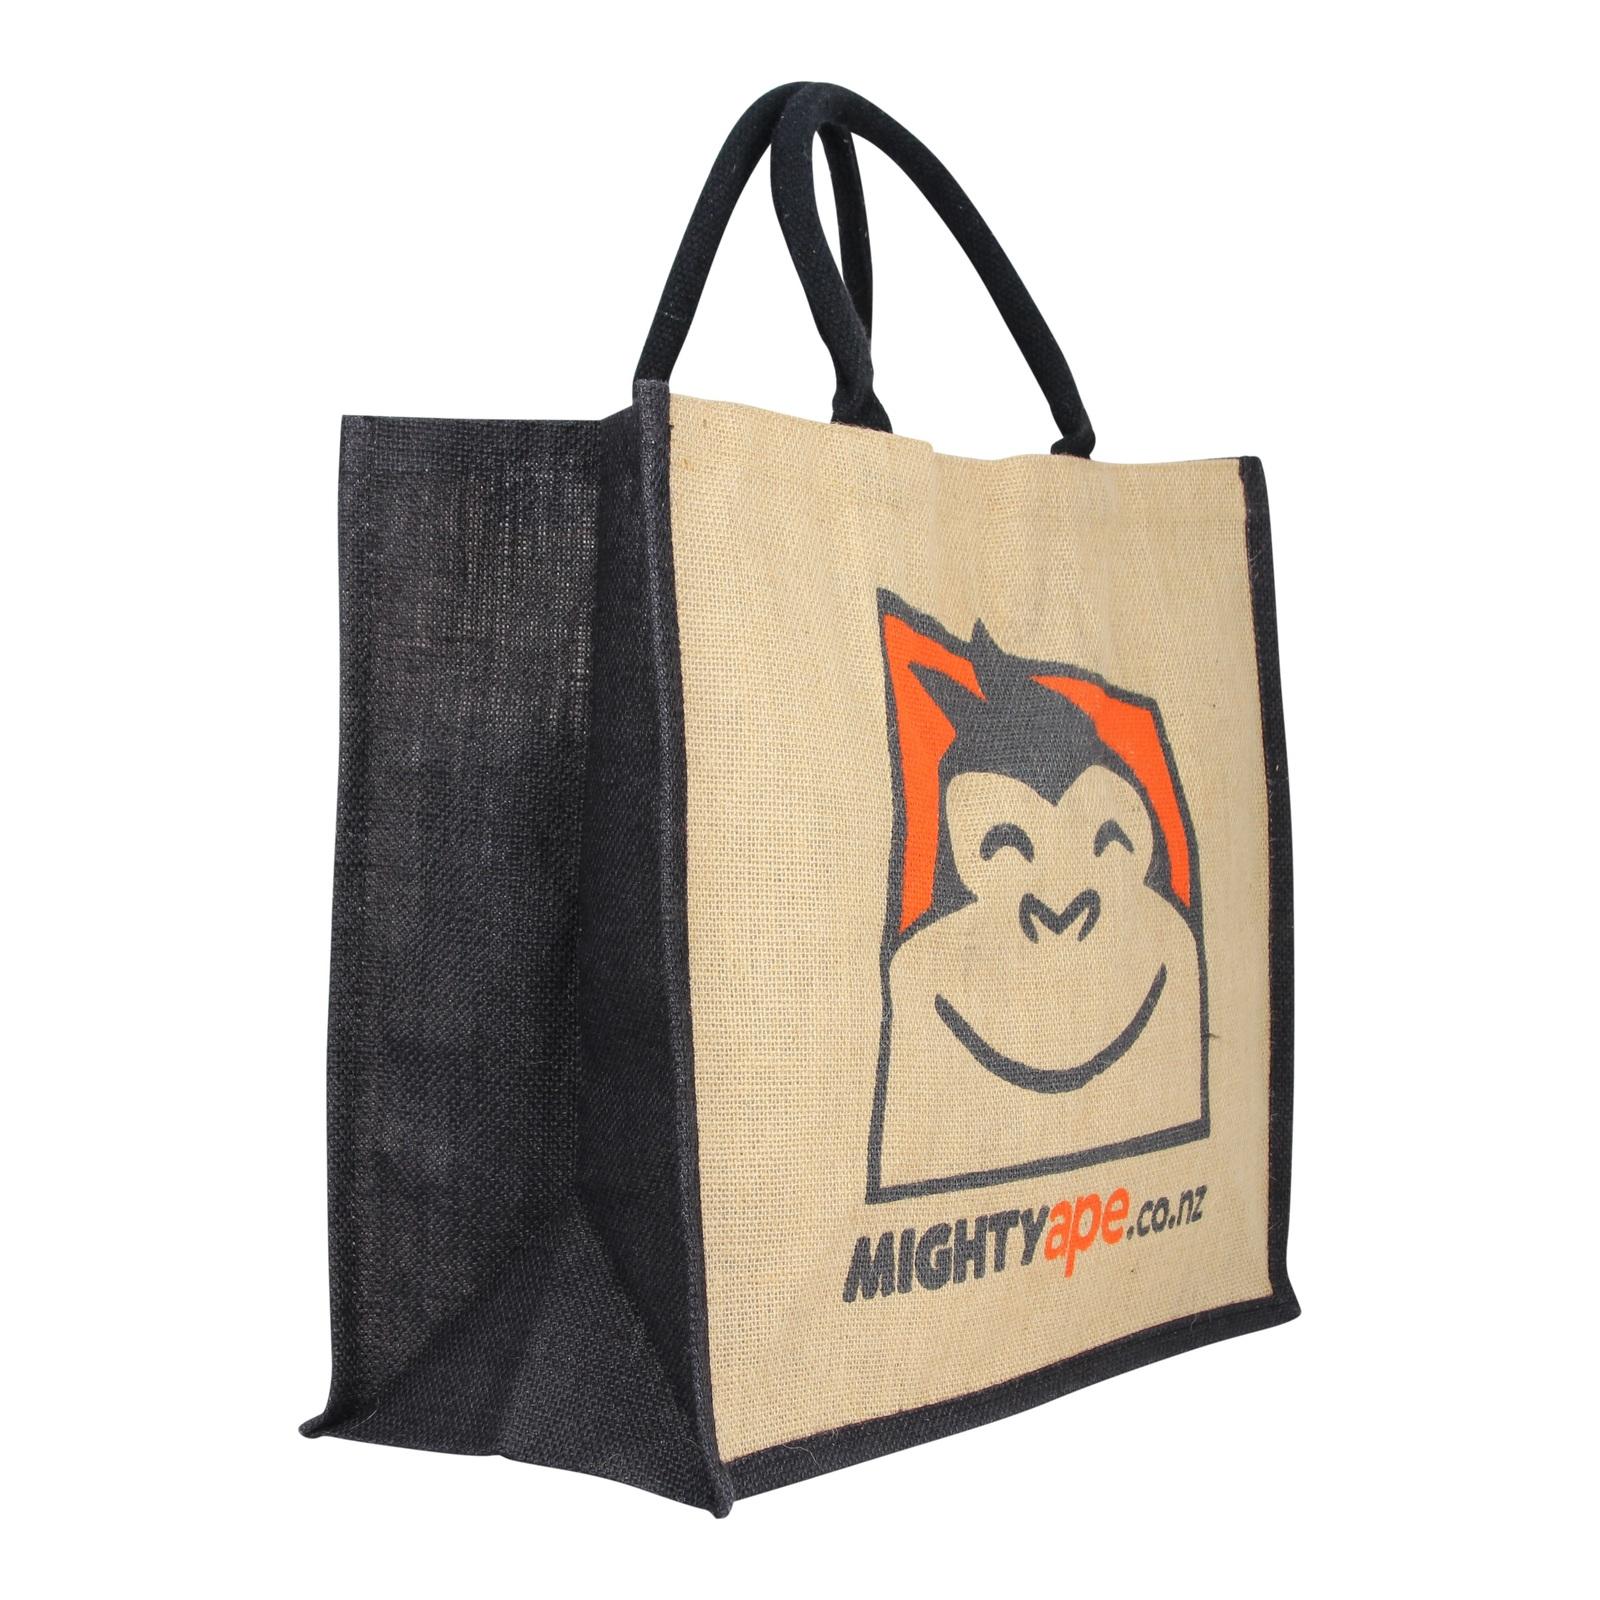 Mighty Ape Reusable Eco Shopping Tote Bag image